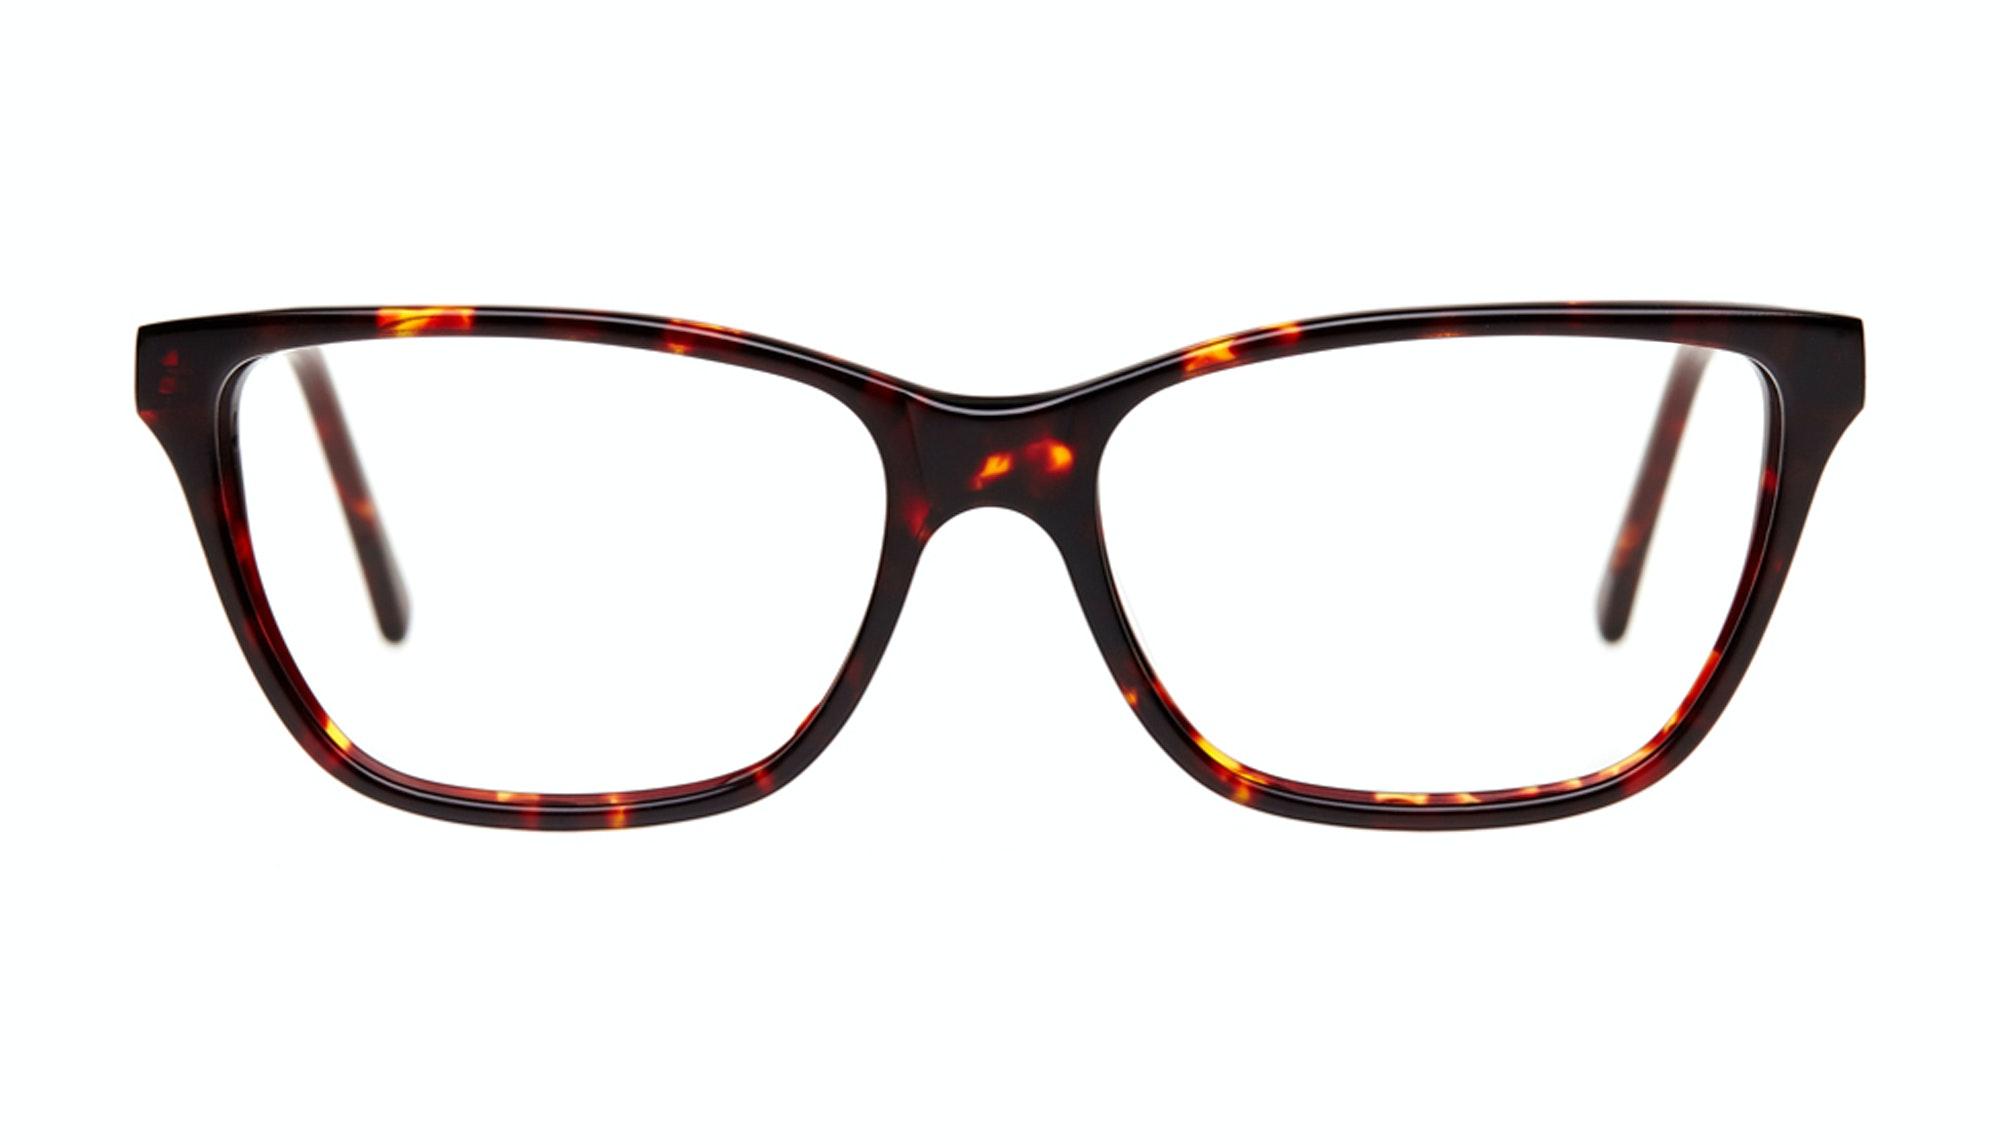 Affordable Fashion Glasses Rectangle Eyeglasses Women Honeybadger Sepia Kiss Front